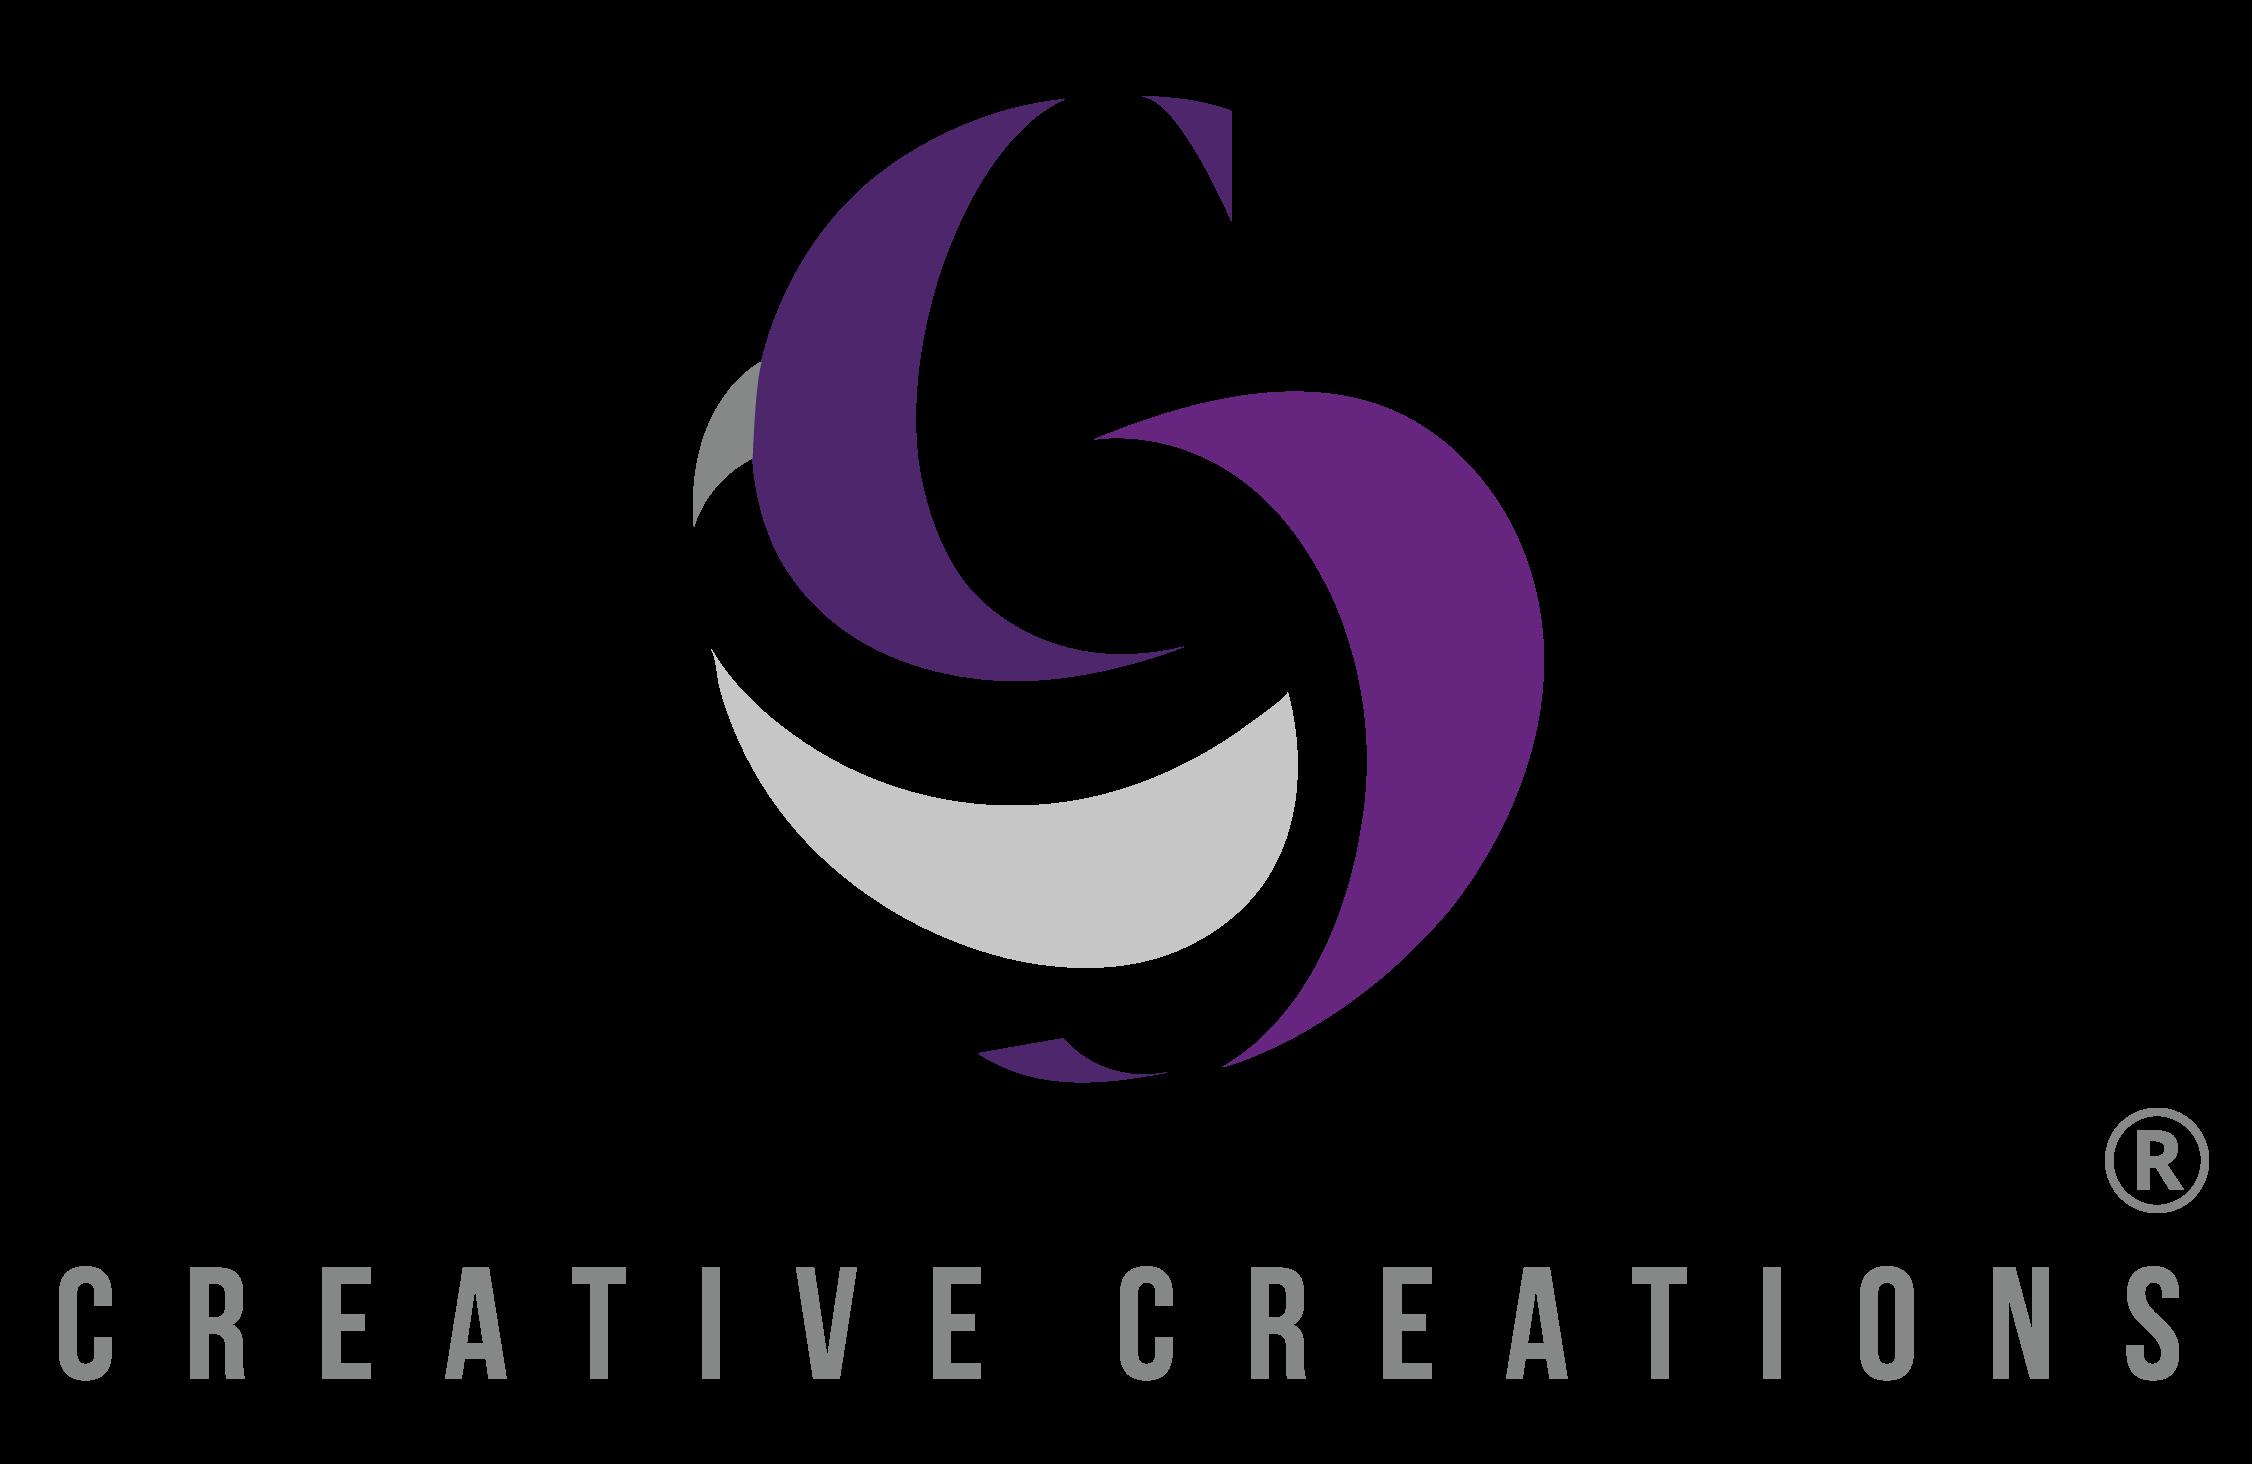 Creative Creations